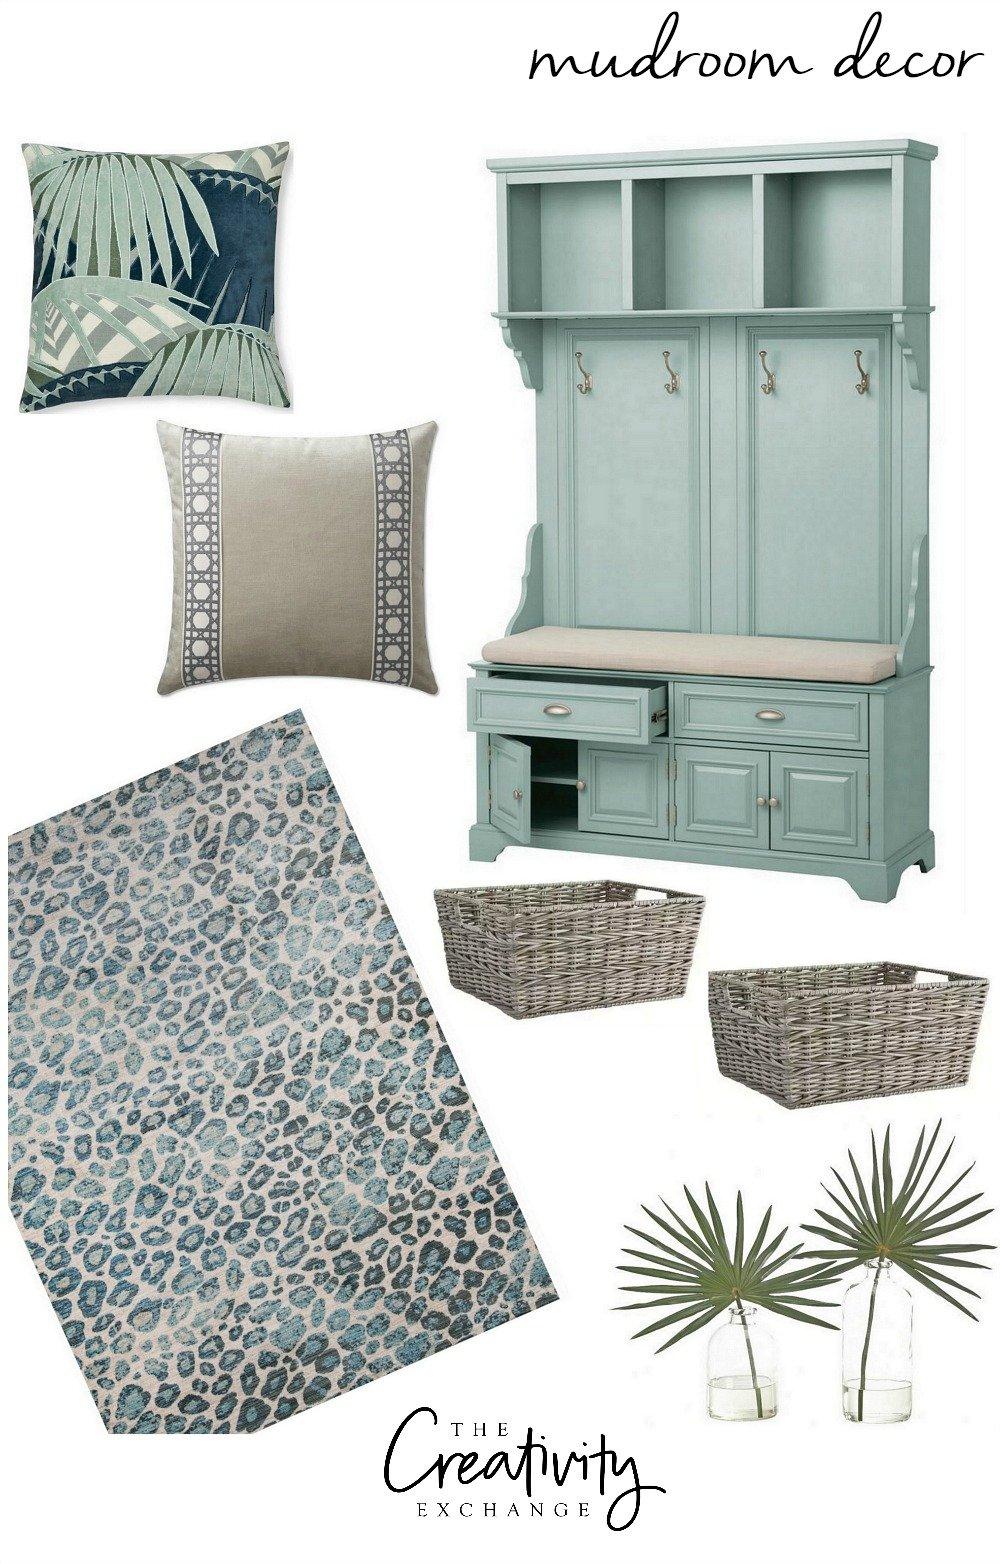 Mudroom decor design board and products